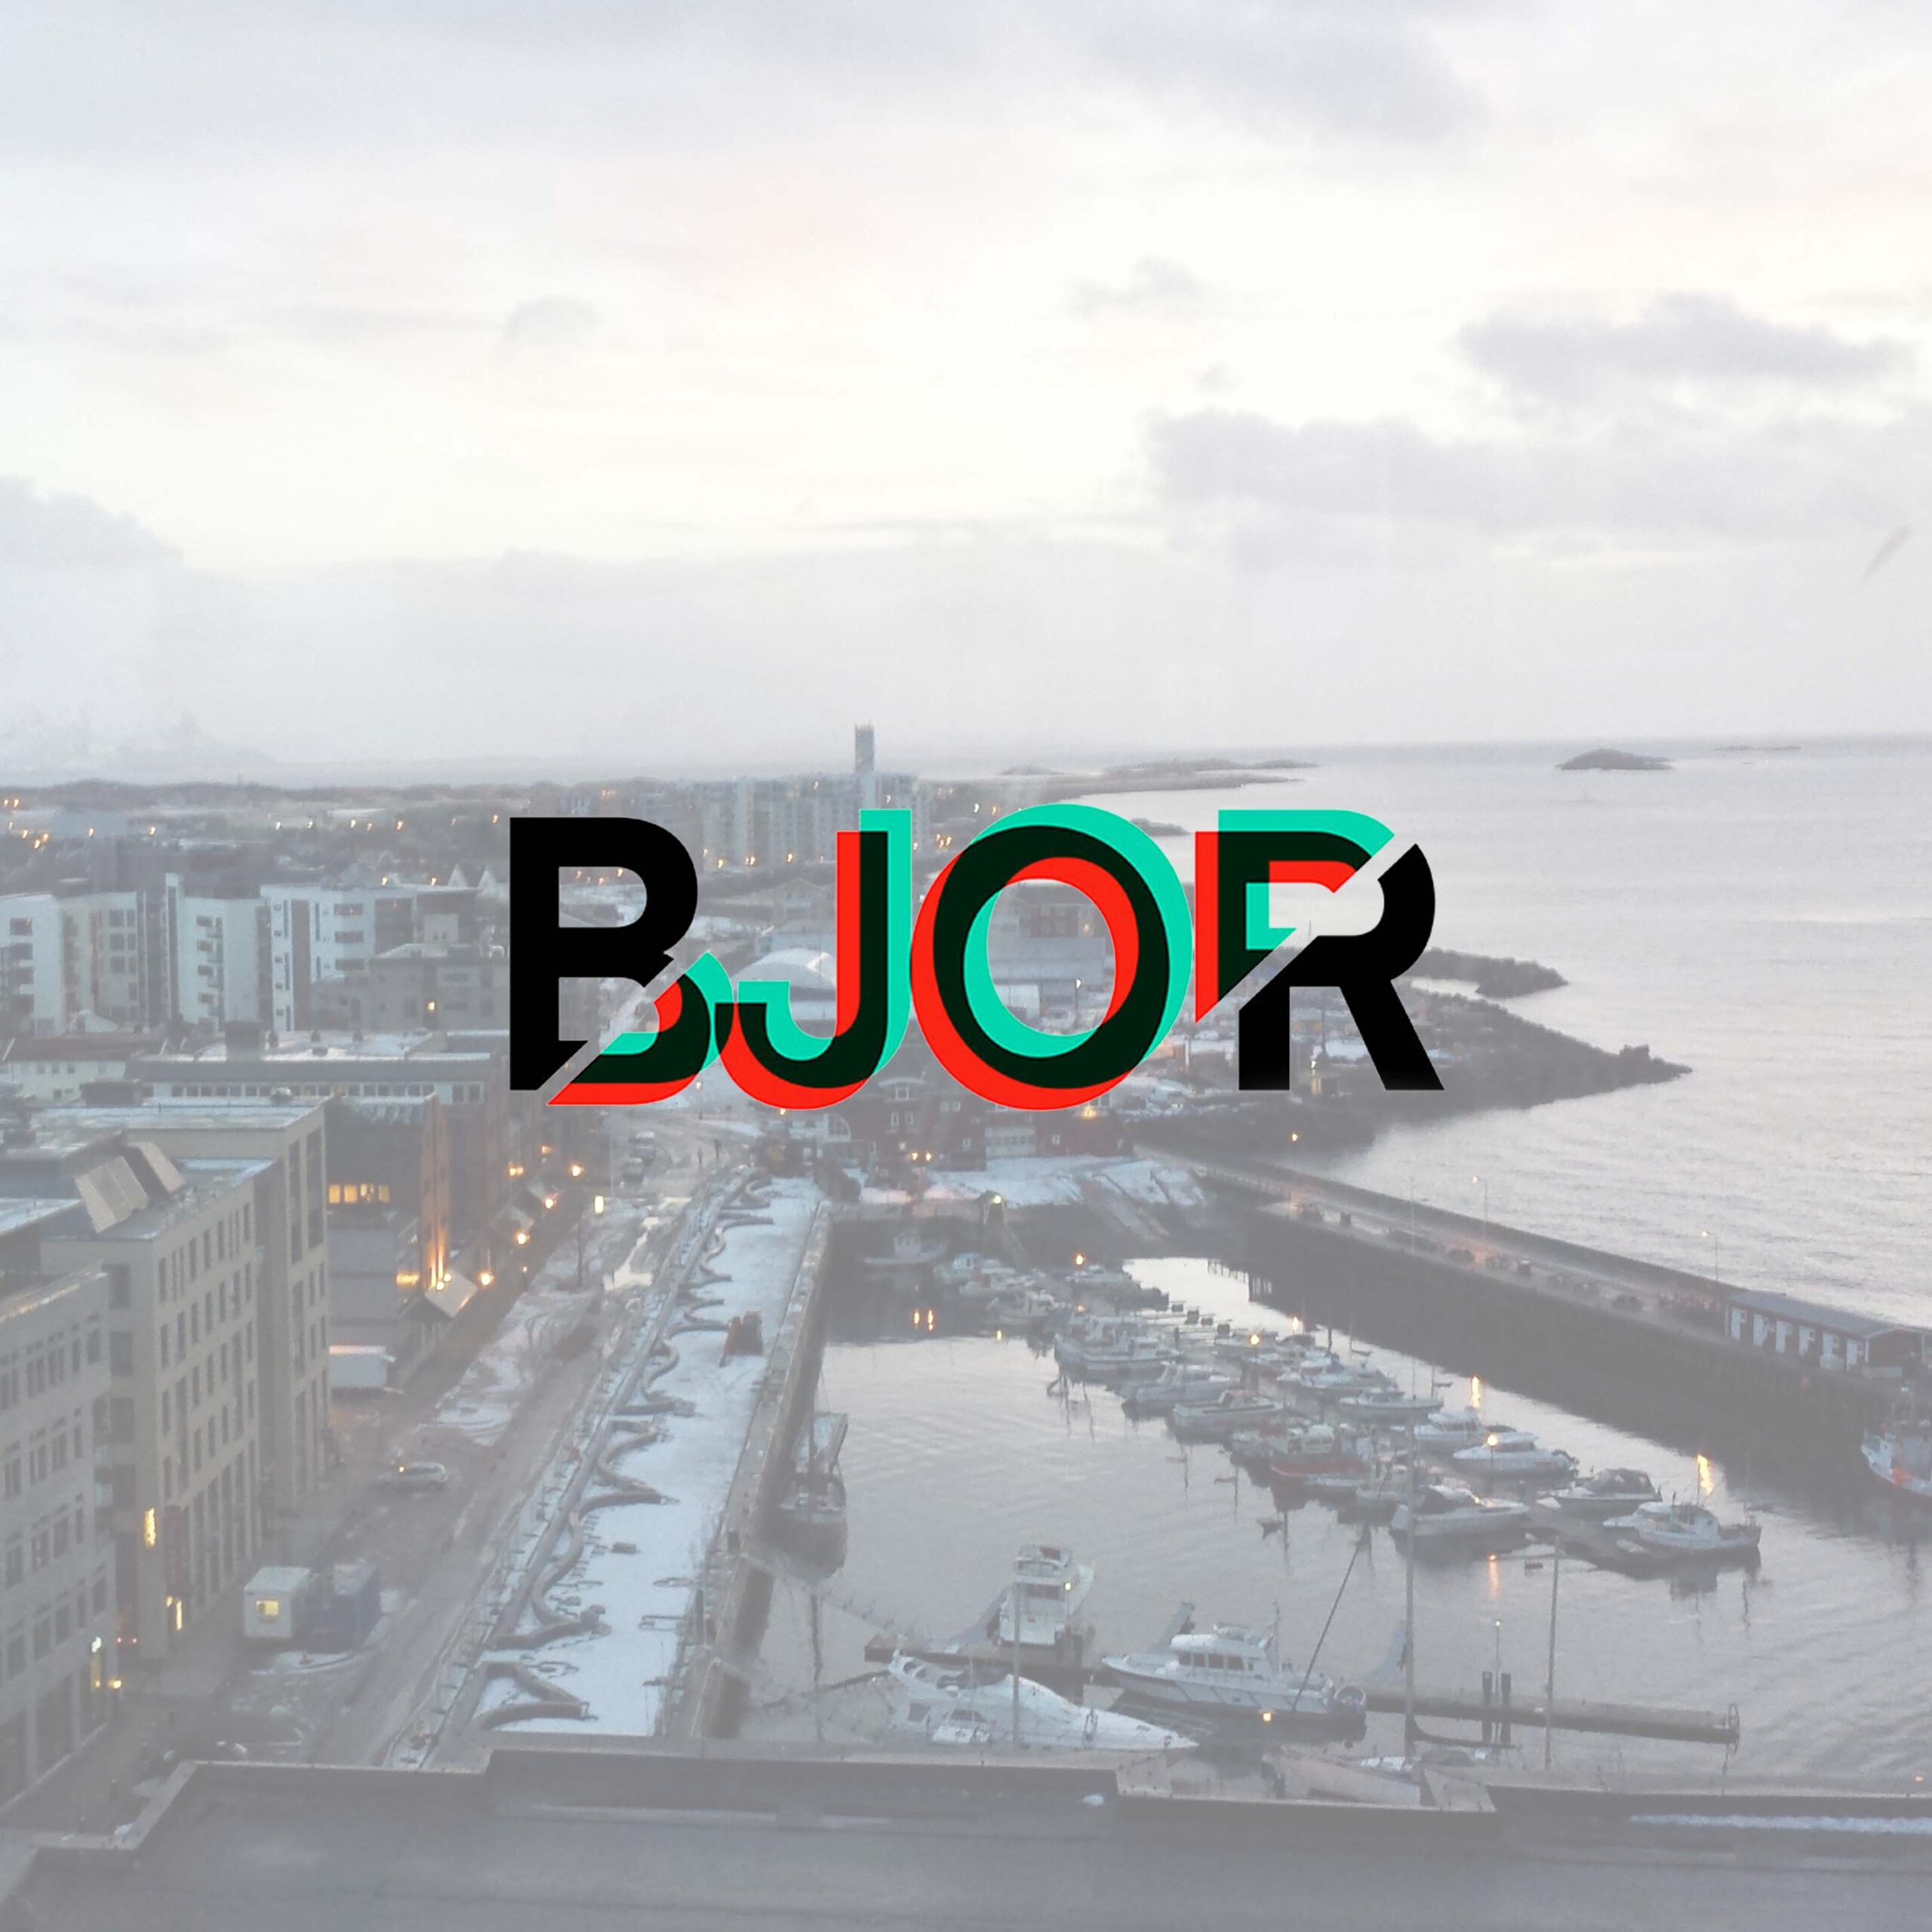 Bjor Bodø The art of Nursing